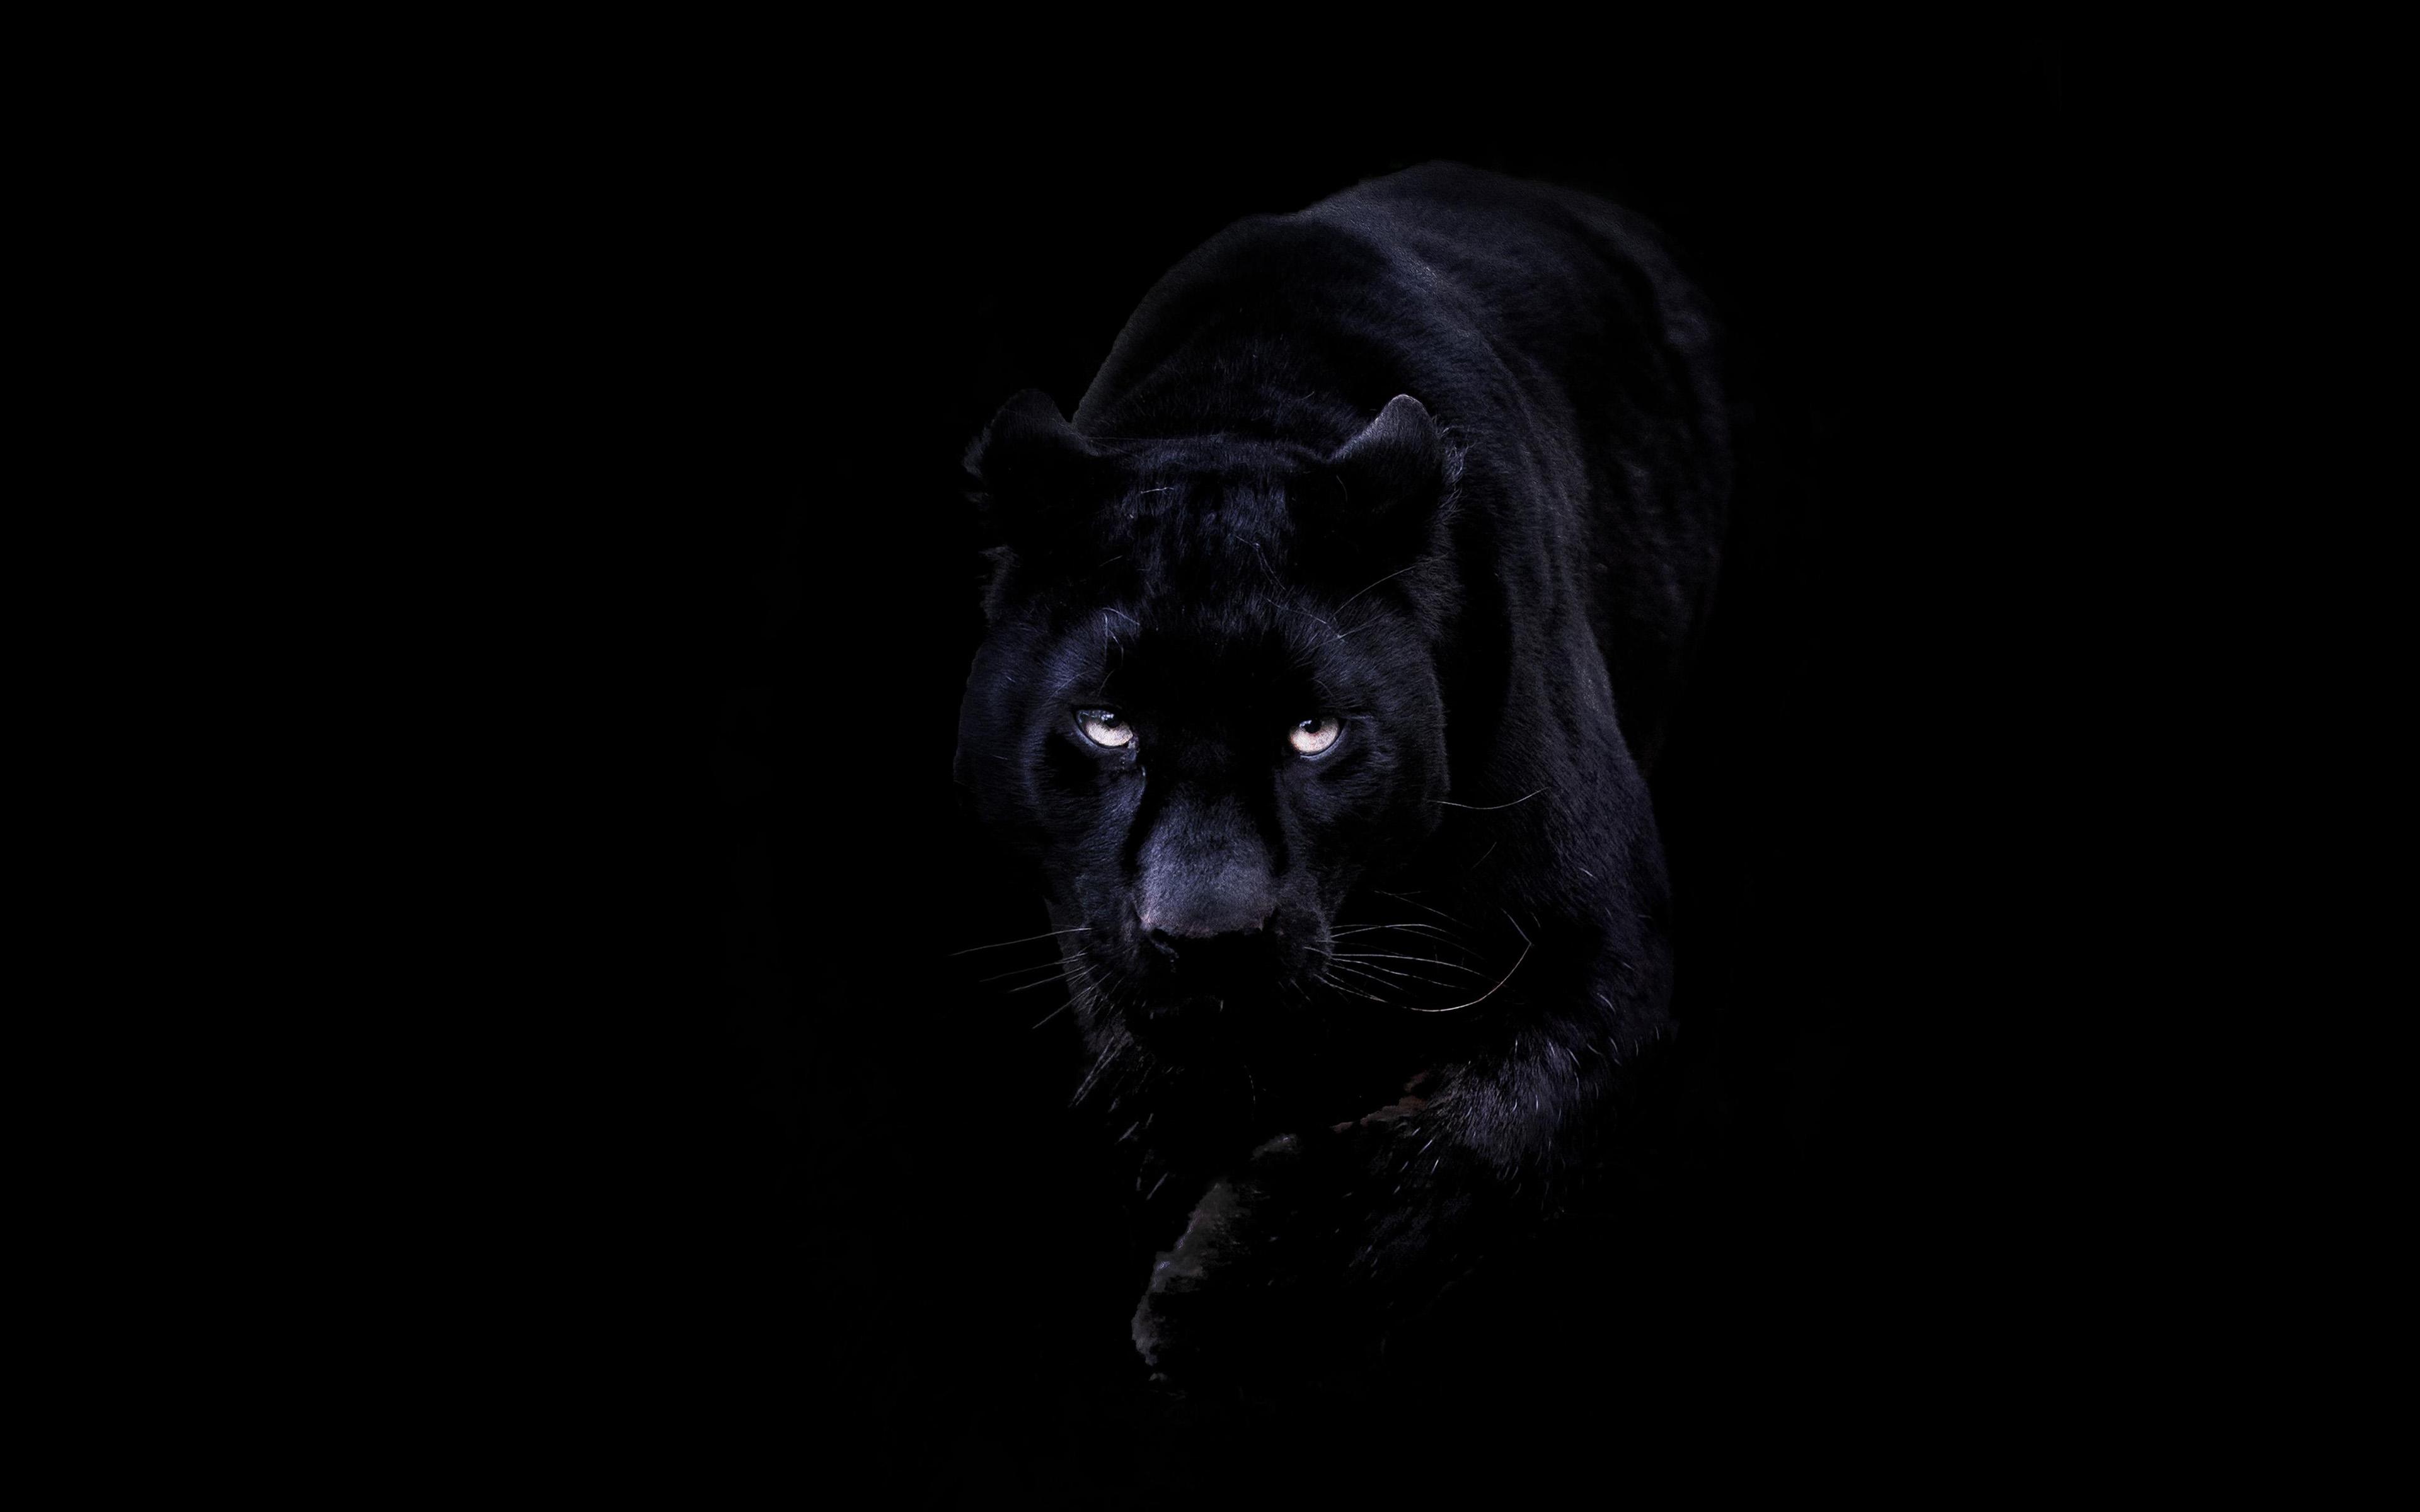 Bd93-animal-dark-black-pahter-art-illustration-wallpaper